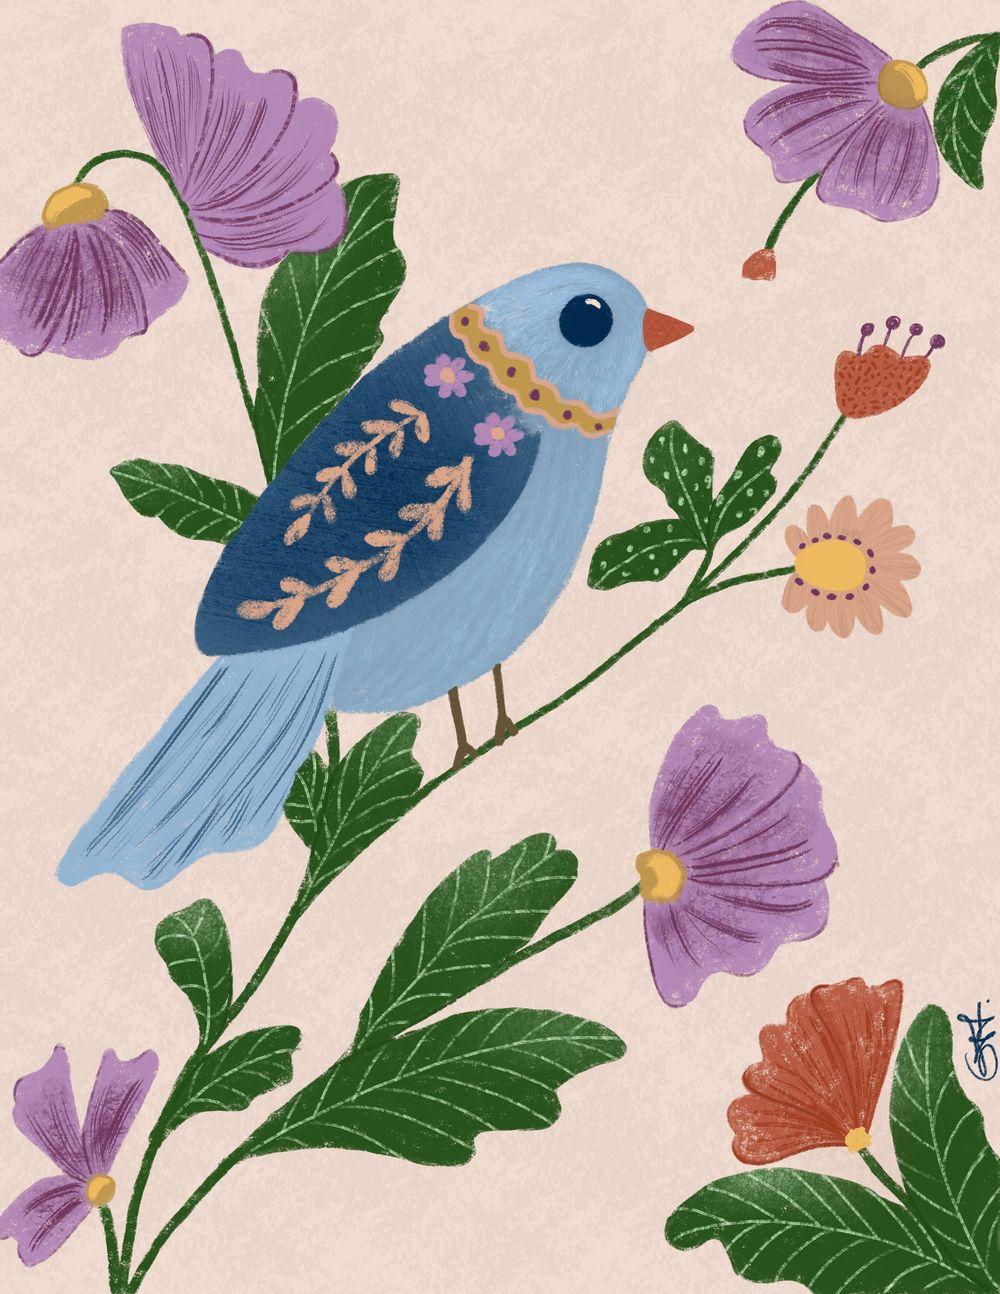 garden bird - image 1 - student project